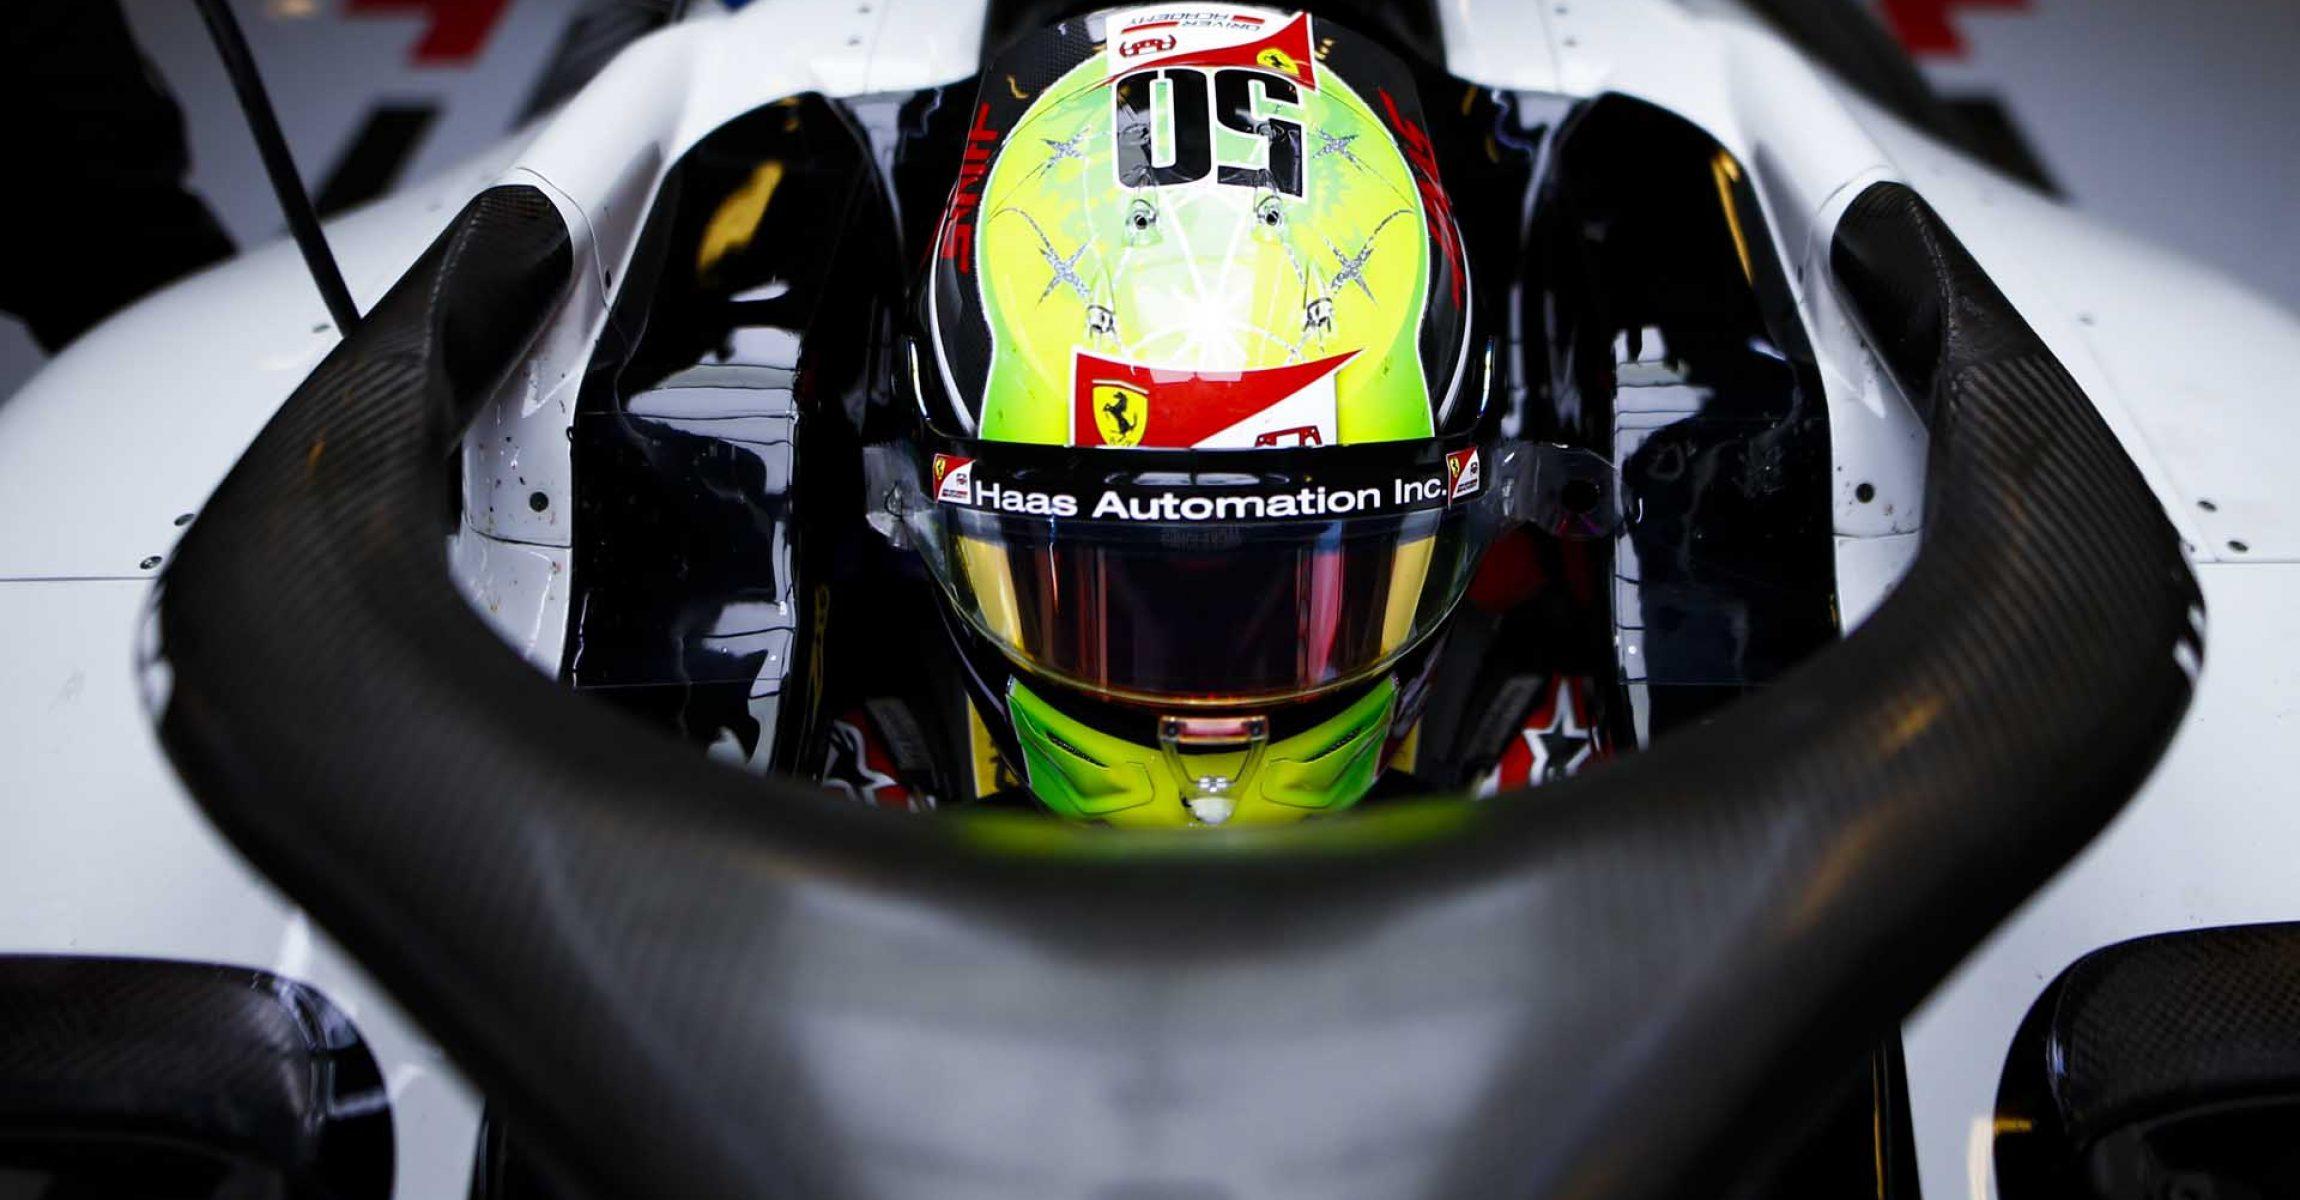 YAS MARINA CIRCUIT, UNITED ARAB EMIRATES - DECEMBER 11: Mick Schumacher, Haas F1 during the Abu Dhabi GP at Yas Marina Circuit on Friday December 11, 2020 in Abu Dhabi, United Arab Emirates. (Photo by Andy Hone / LAT Images)